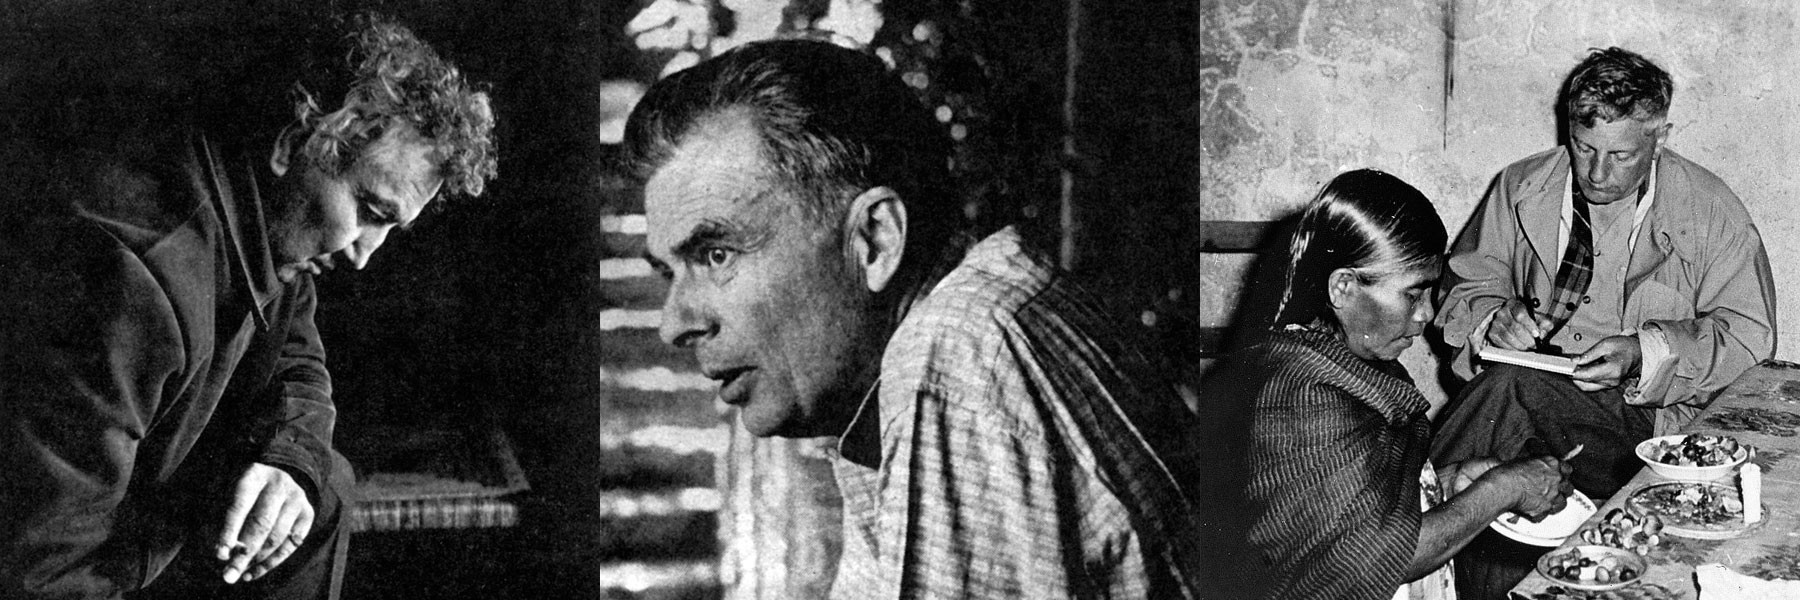 Graves, Robert, Huxley, Aldous, Wasson, Robert Gordon